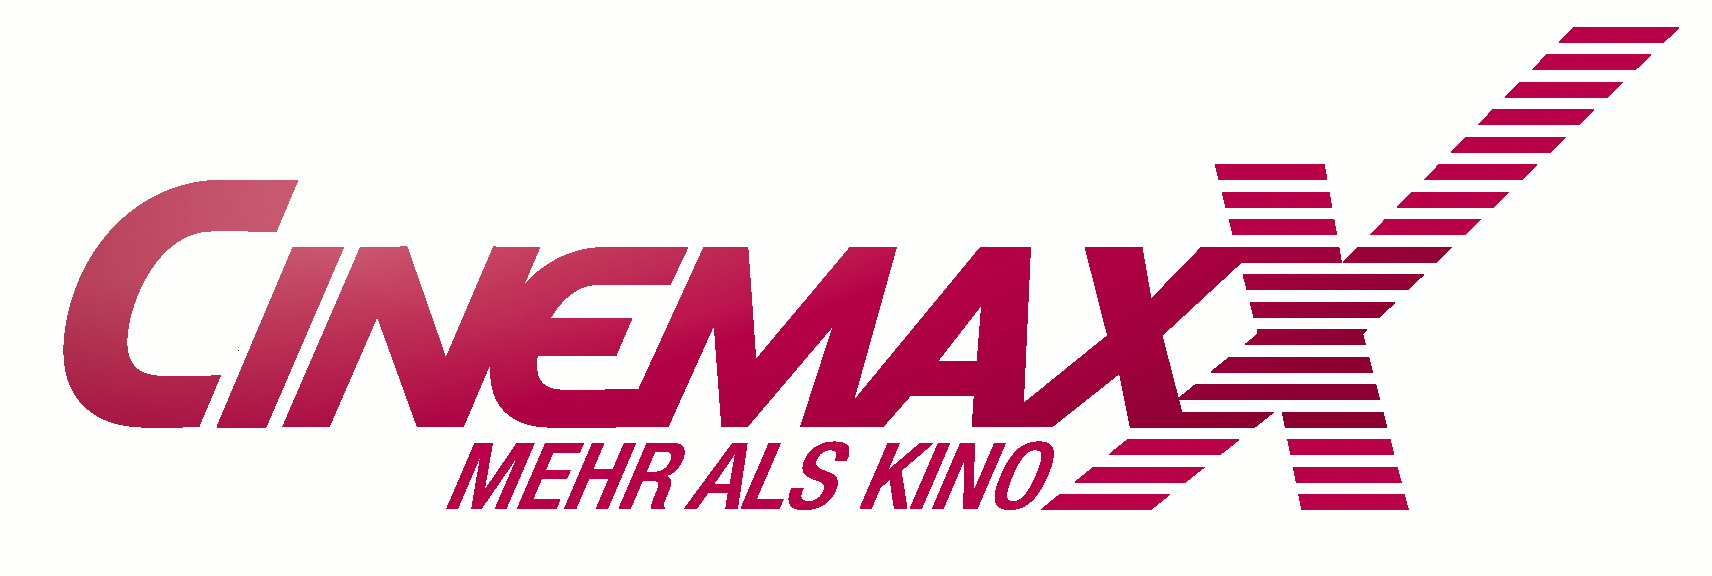 Kinoprogramm im CinemaxX Bielefeld · Bielefeld (Innenstadt) · KINO.de